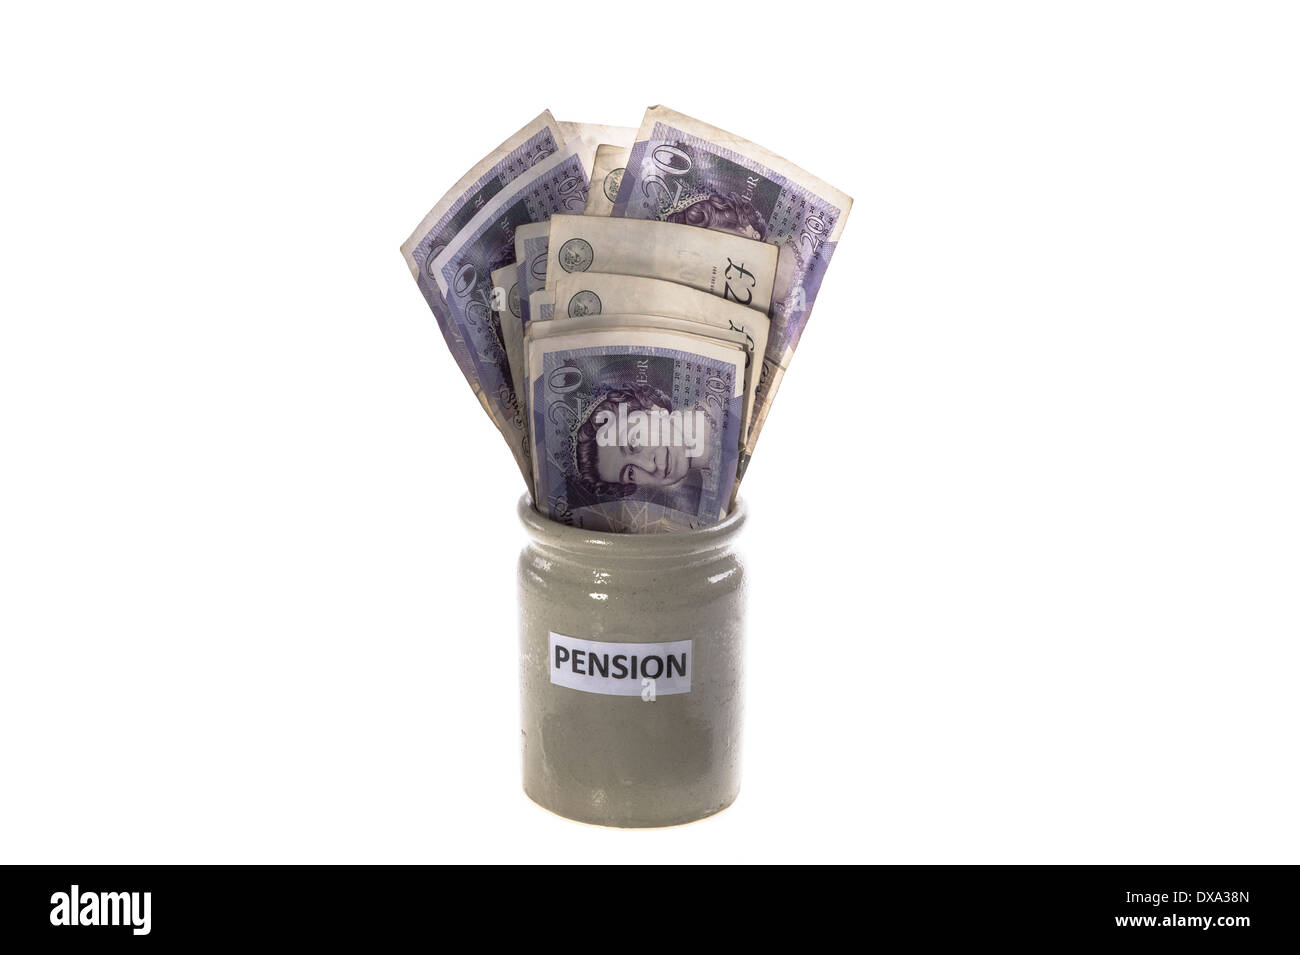 Pension pot. - Stock Image